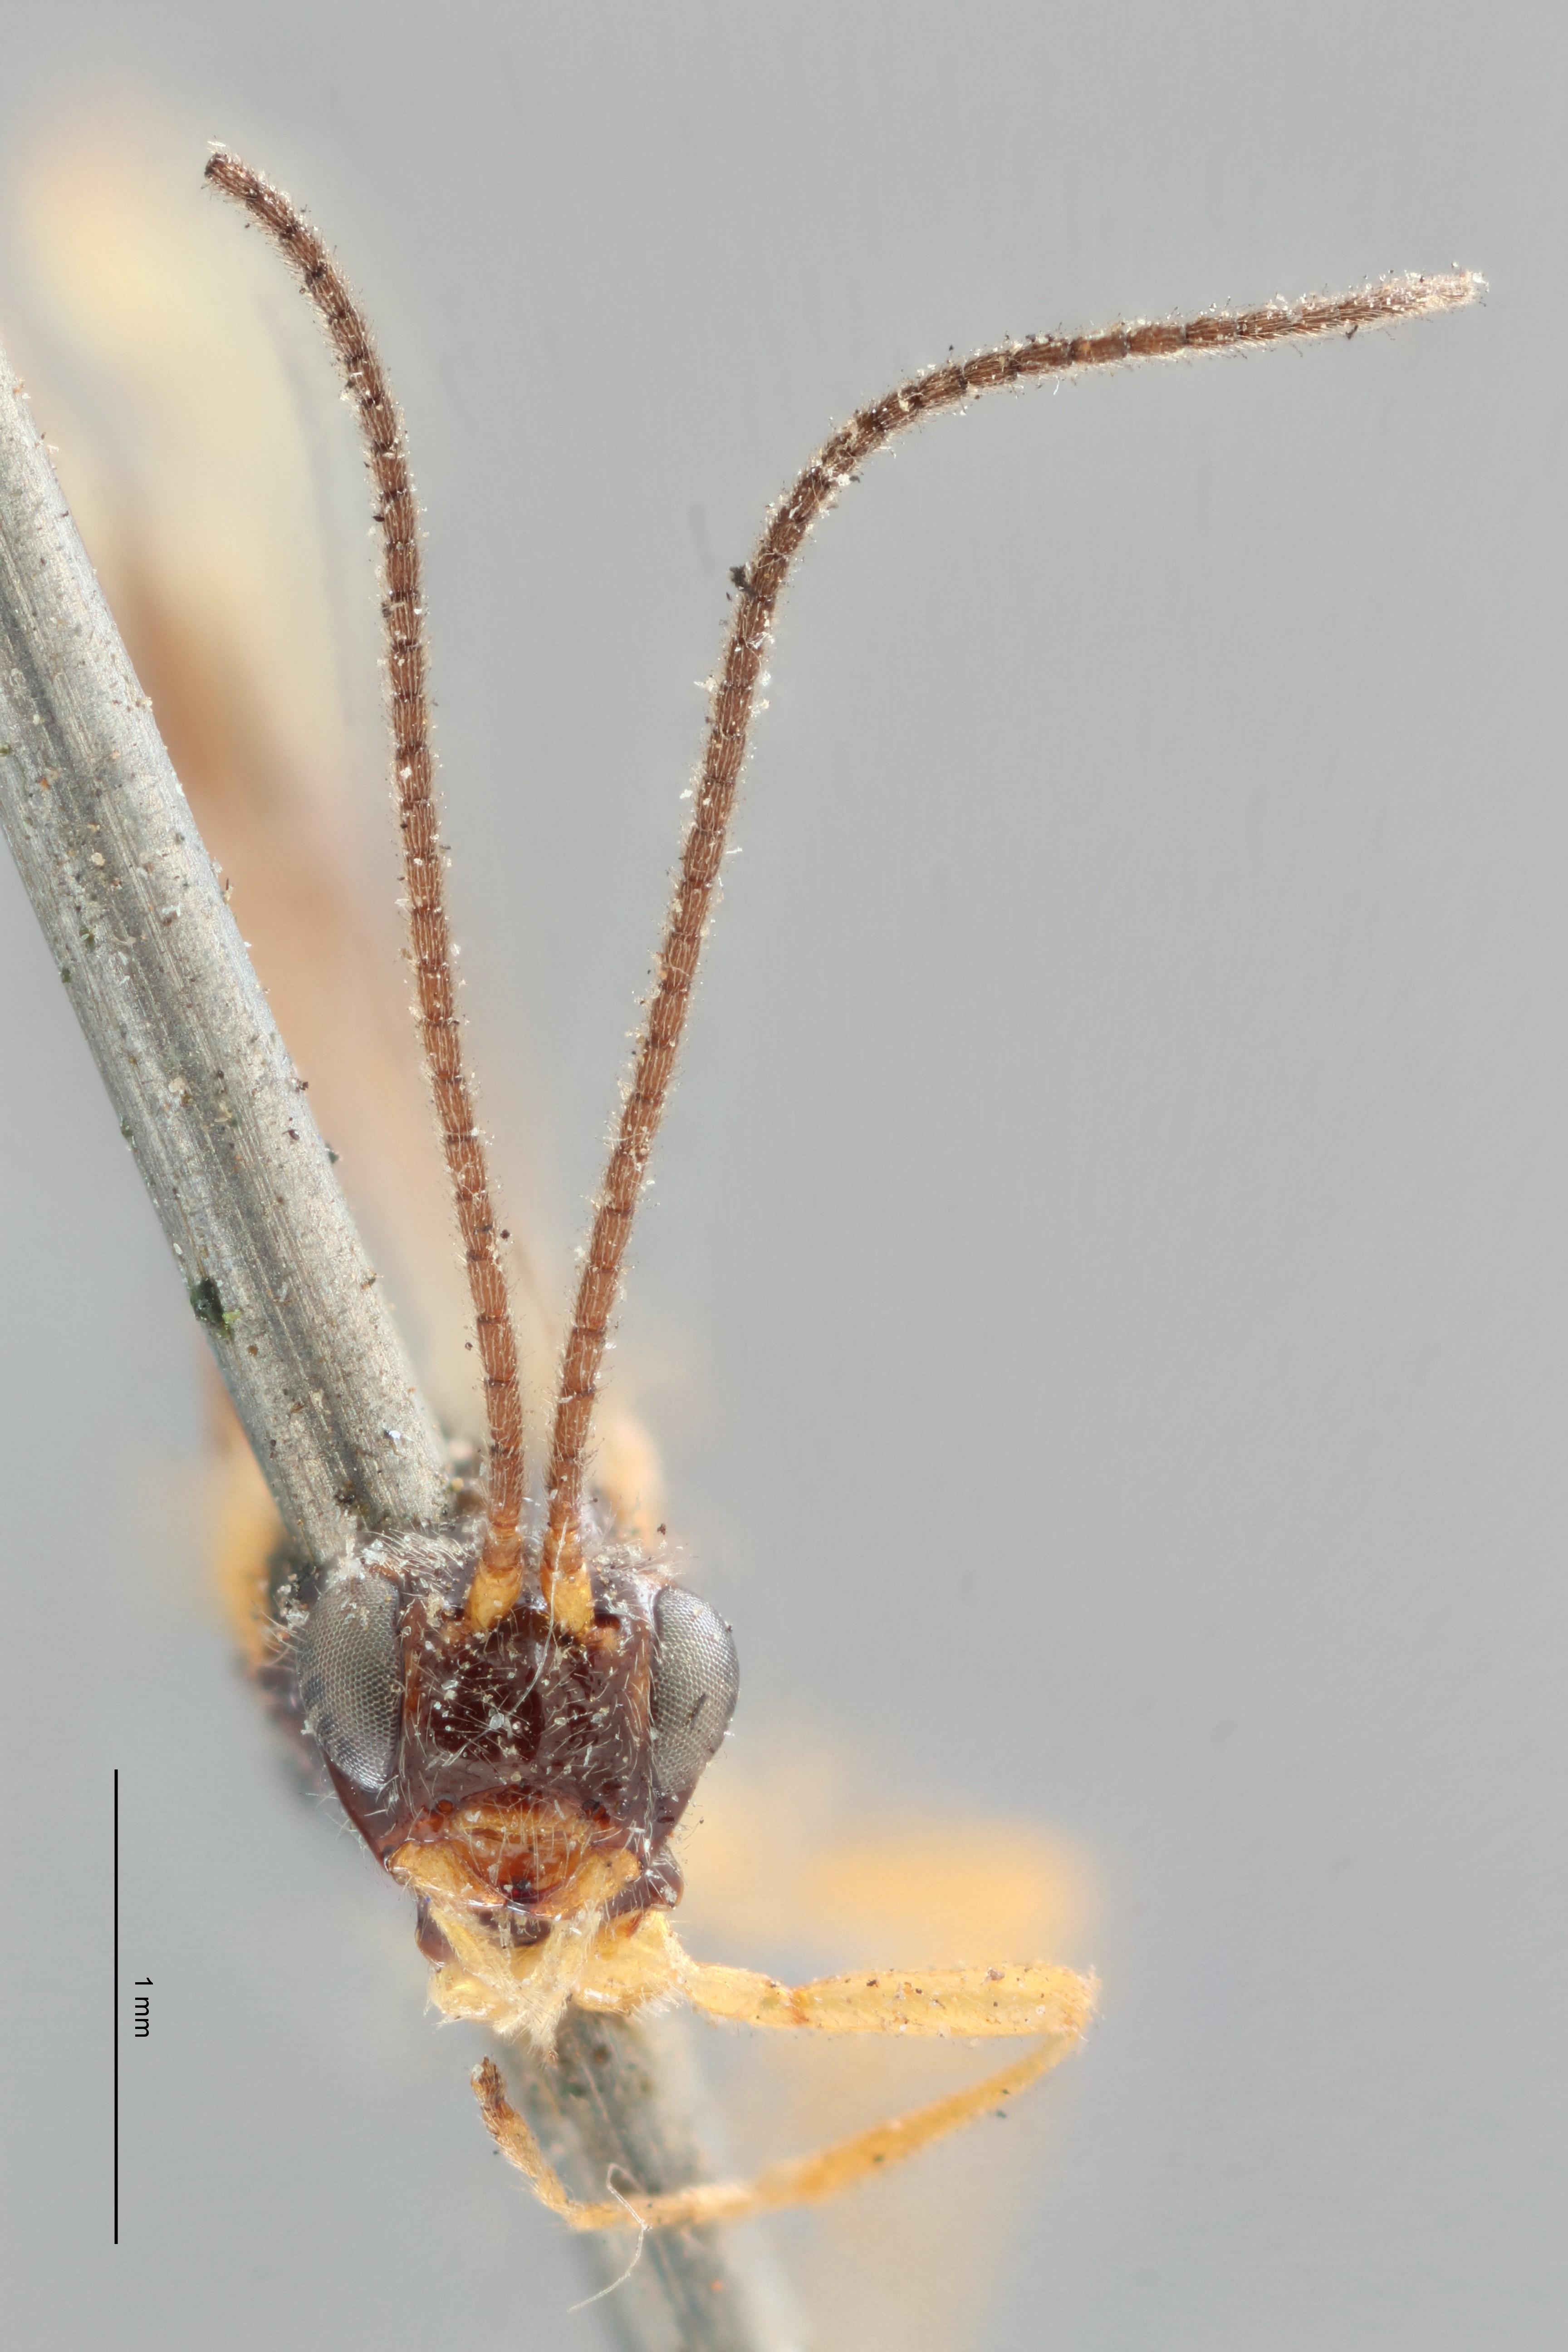 Opius truncatus lct F ZS PMax.jpg